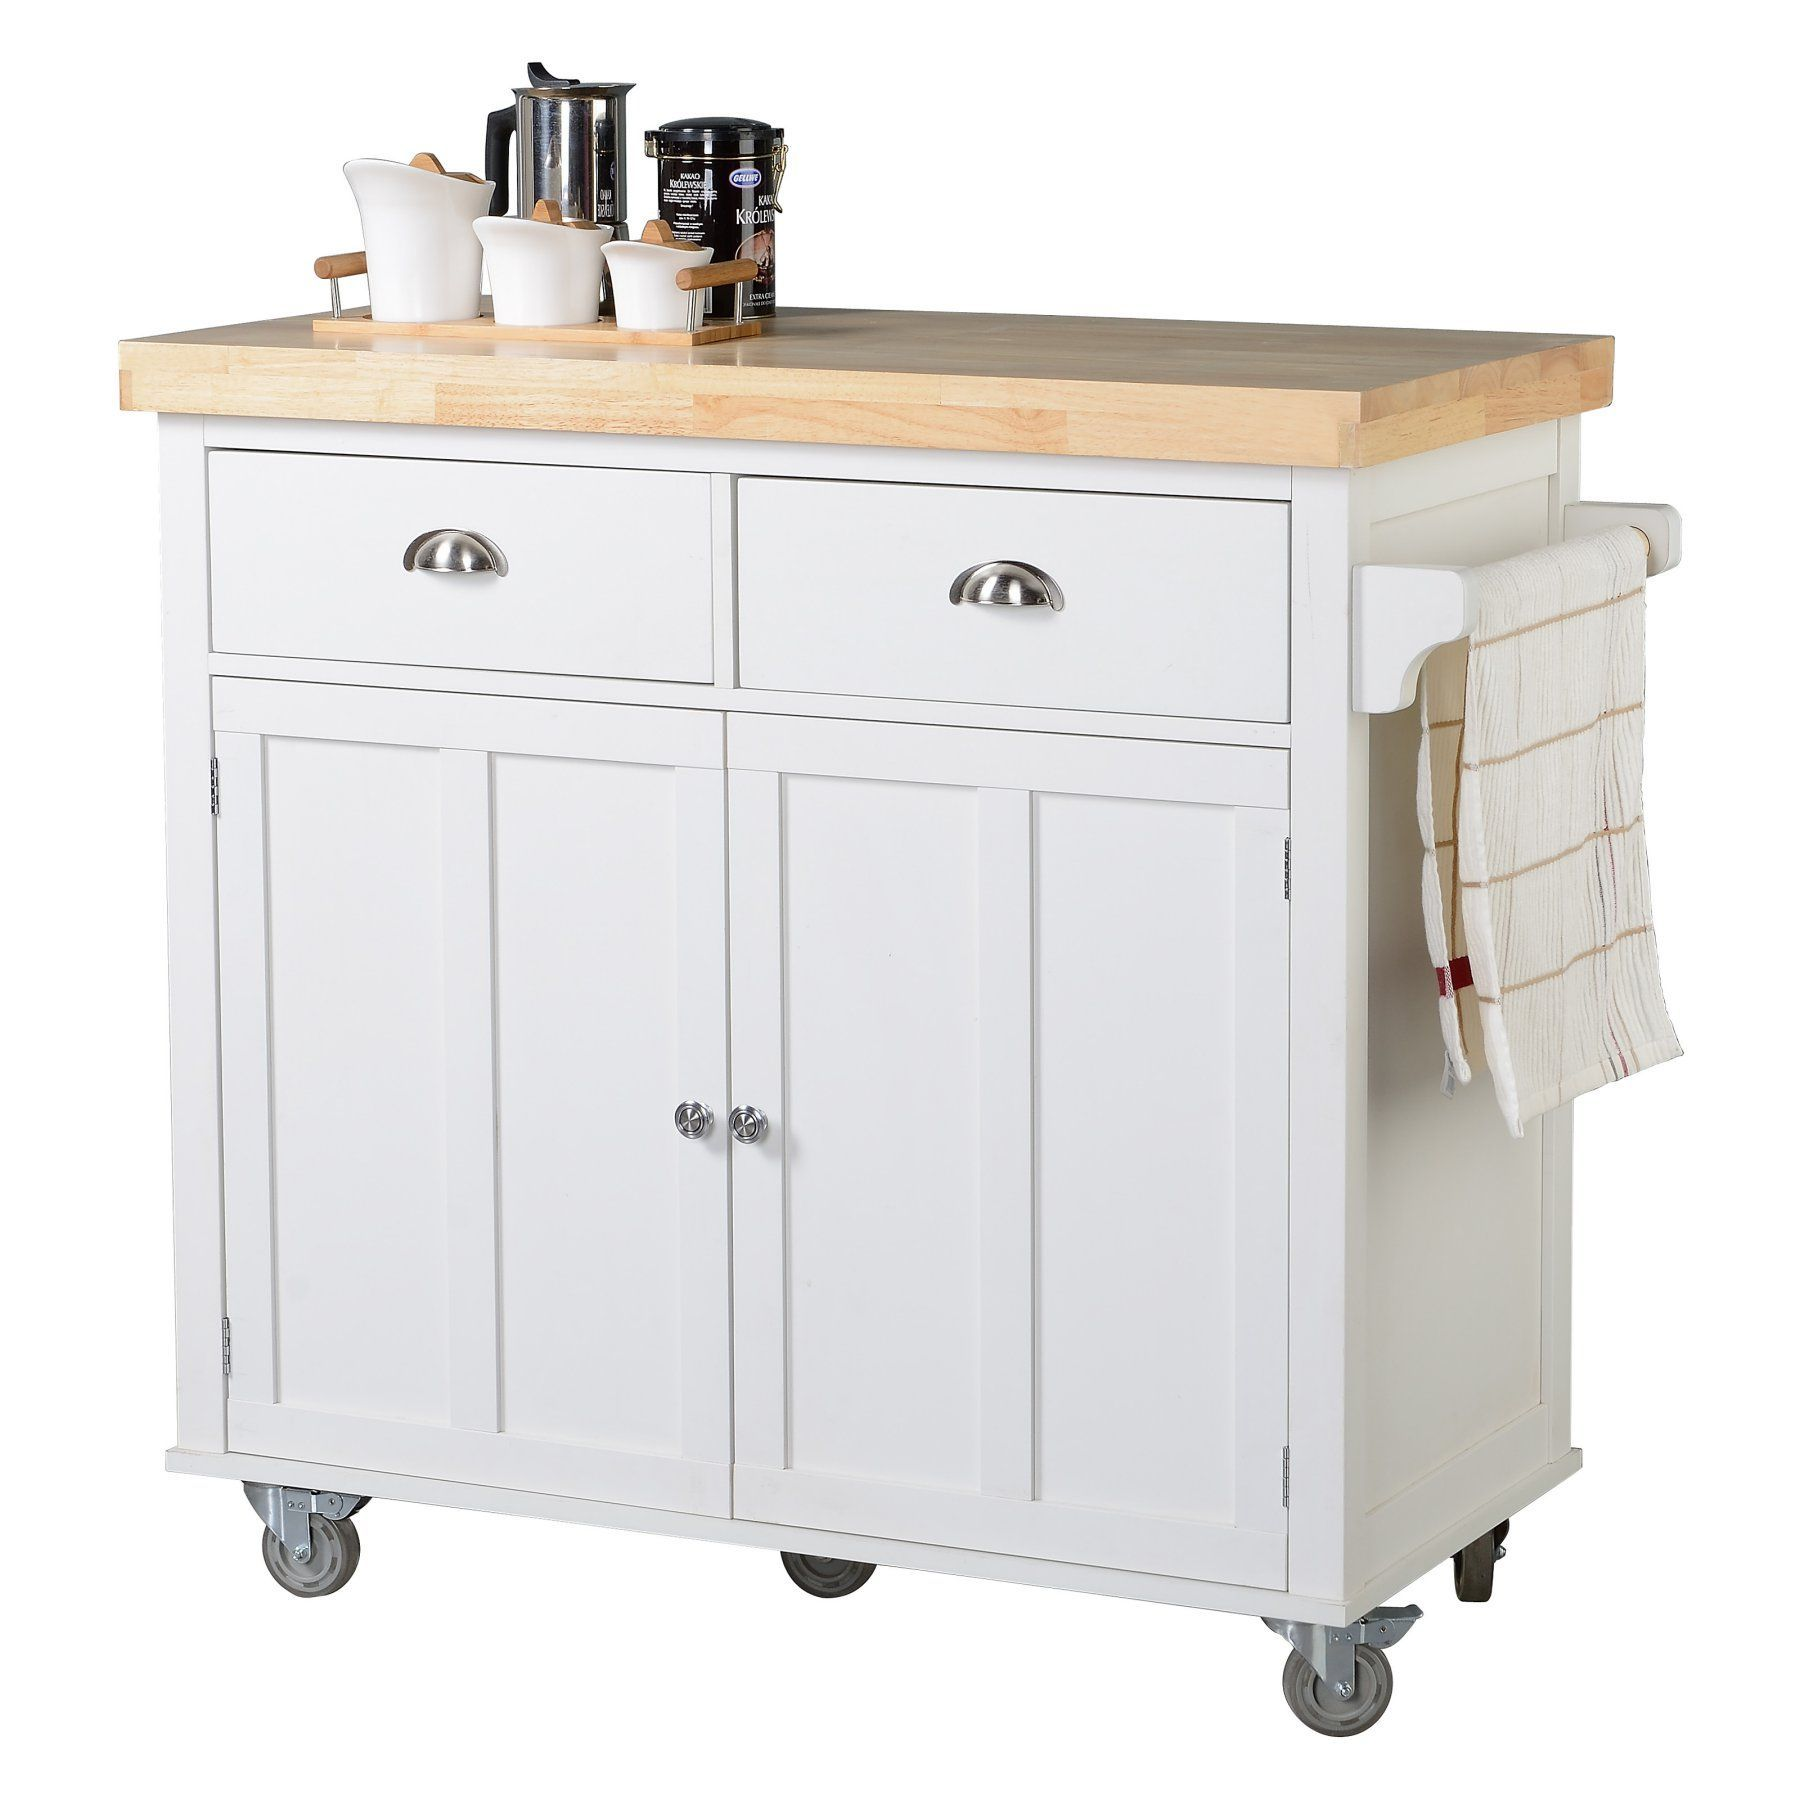 HomeStar 2 Door Portable Kitchen Cart - Z13070001 | Products | Pinterest